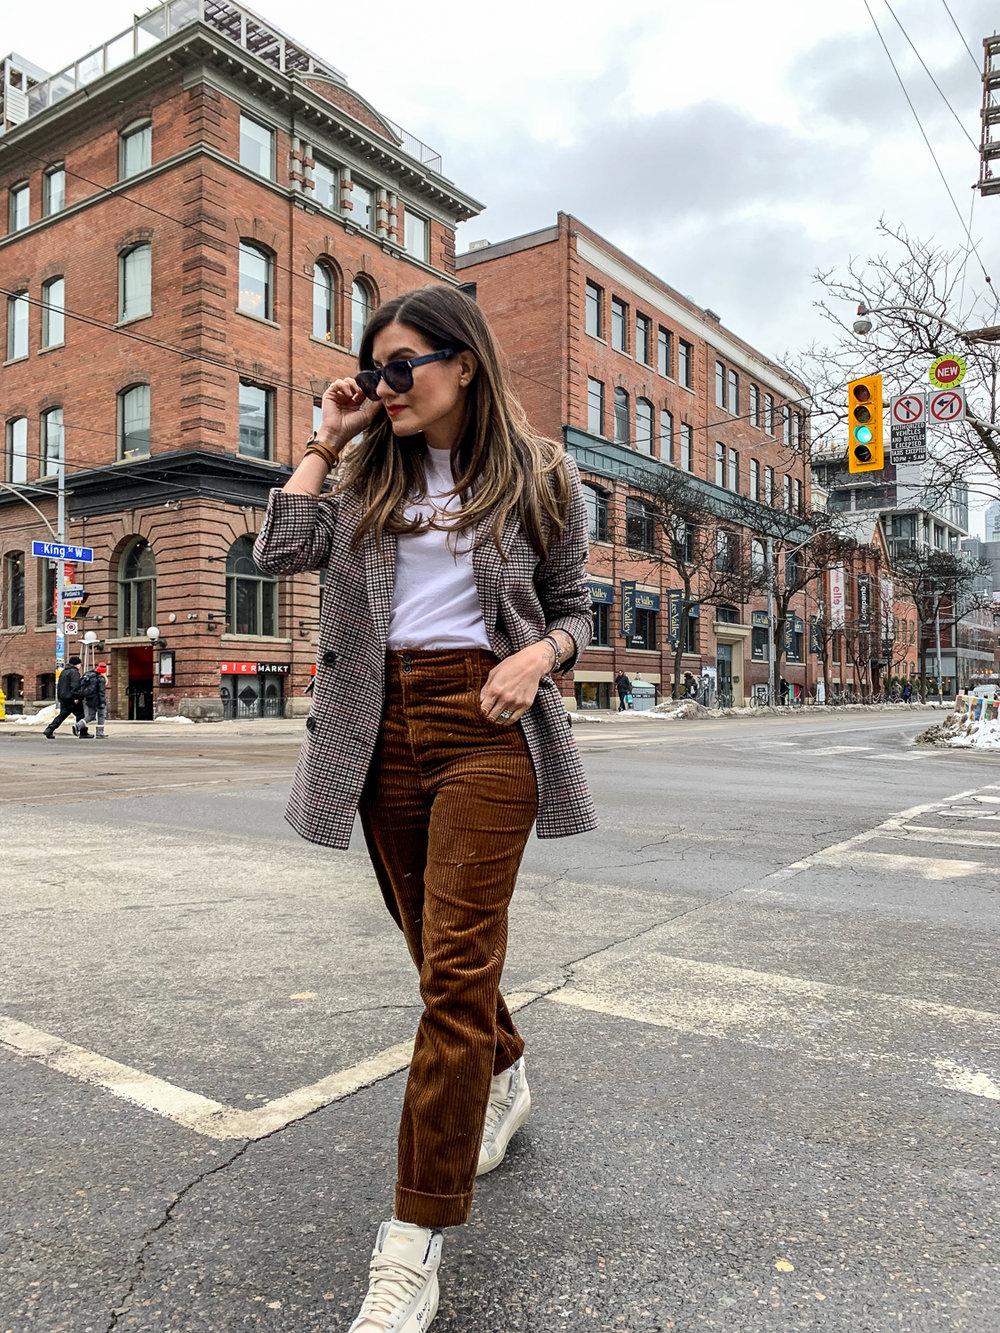 nathalie martin, brown corduroy pants, sandro paris t-shirt, frank and oak brown plaid oversized blazer, saint laurent high top canvas sneakers, woahstyle.com, street style_5200.jpg